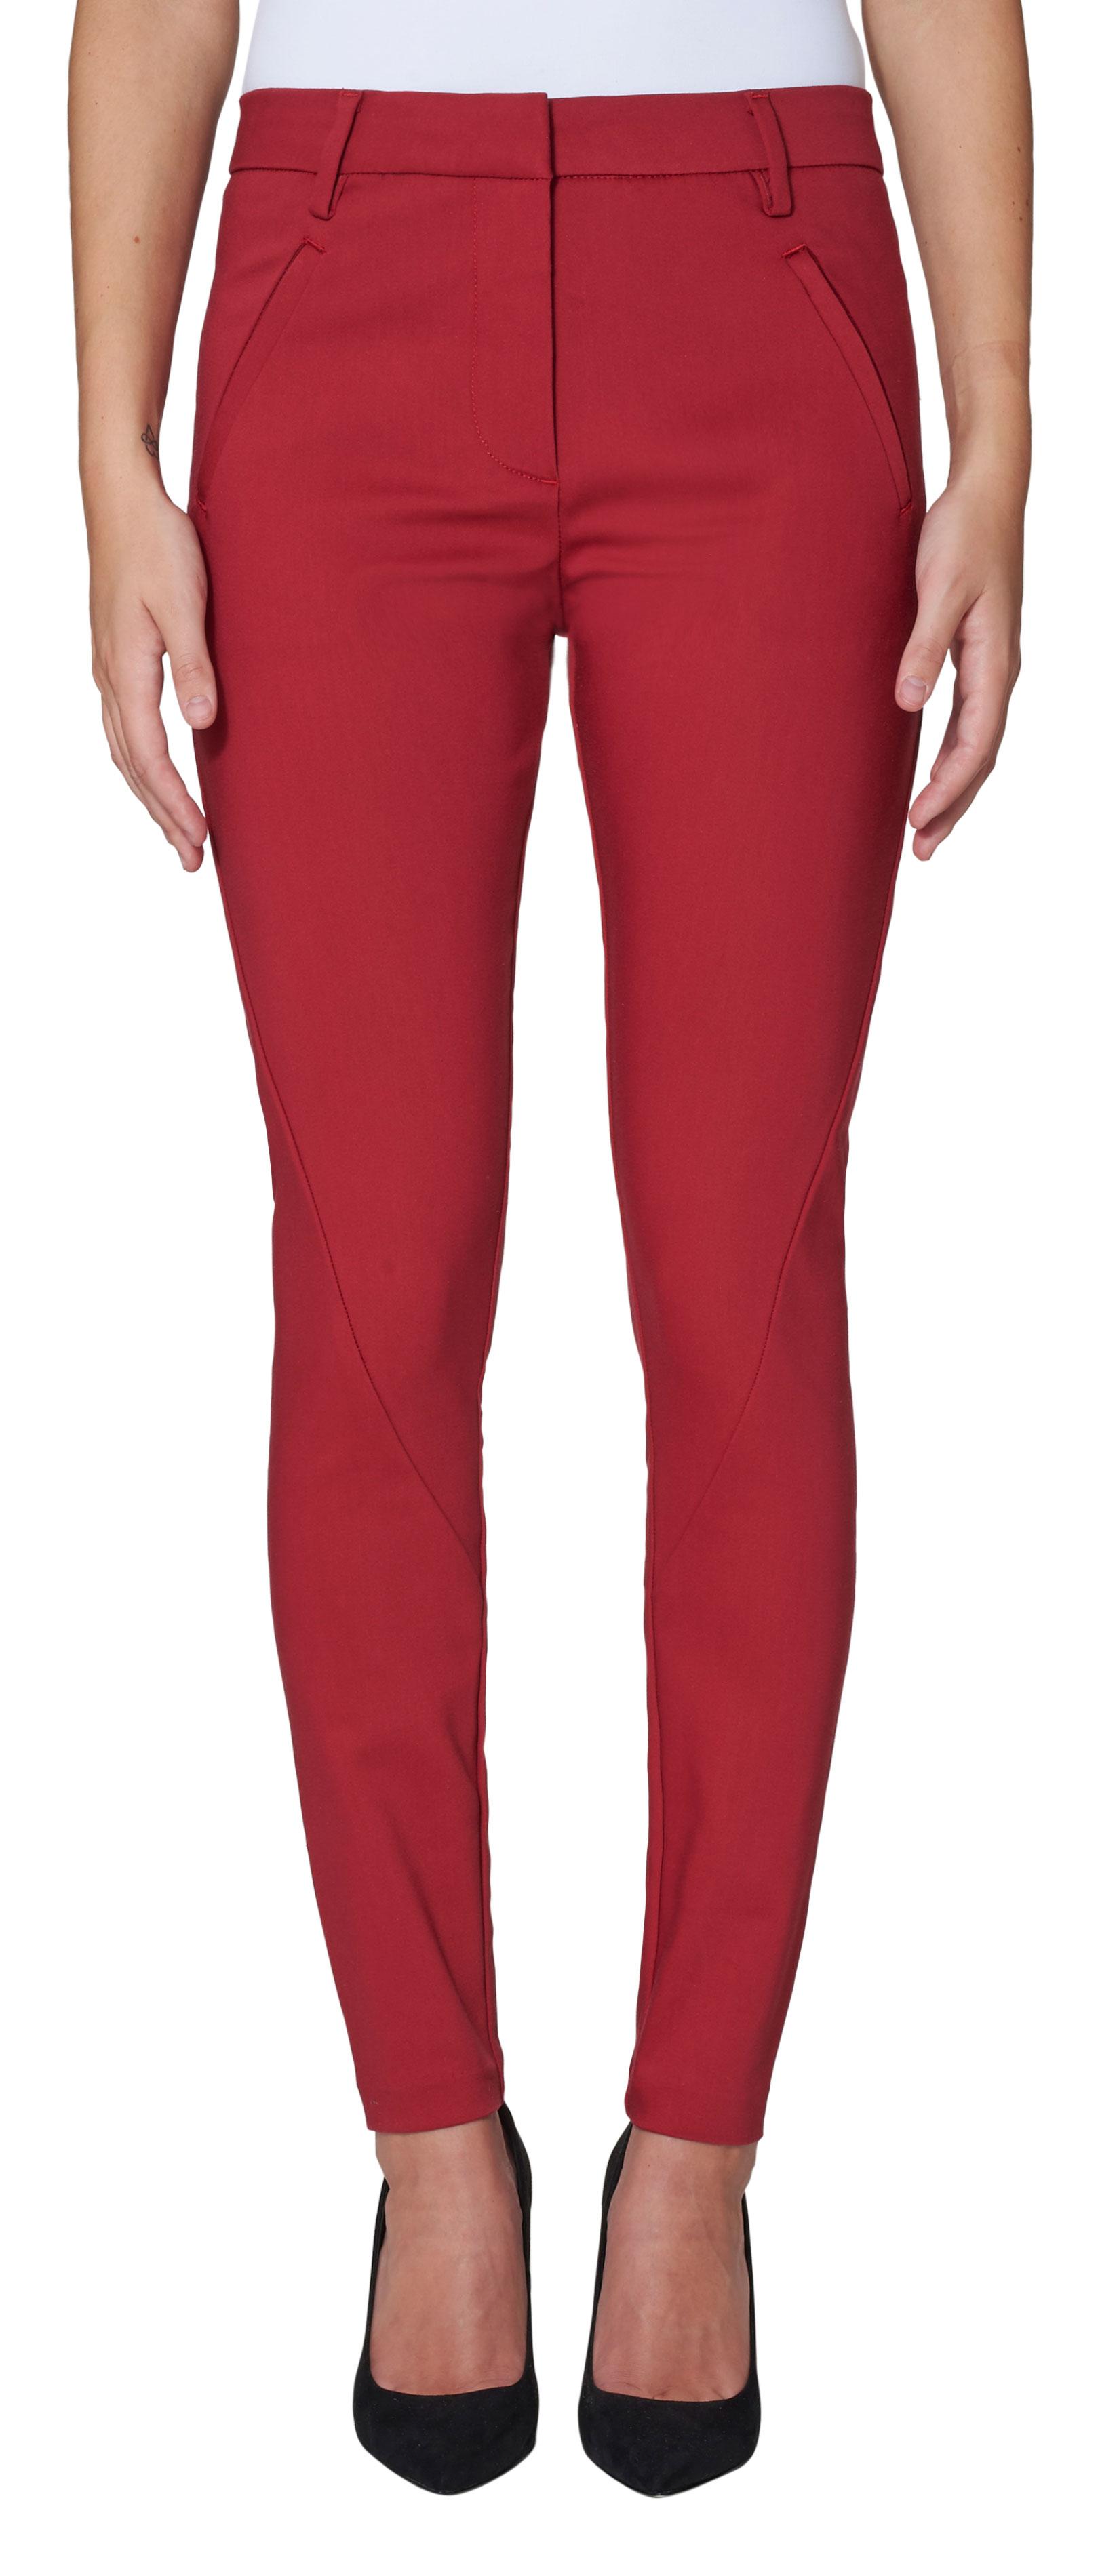 43b0db39 Five Units bukse, rød dressbukse fra Five Units, Angelie Rio Red